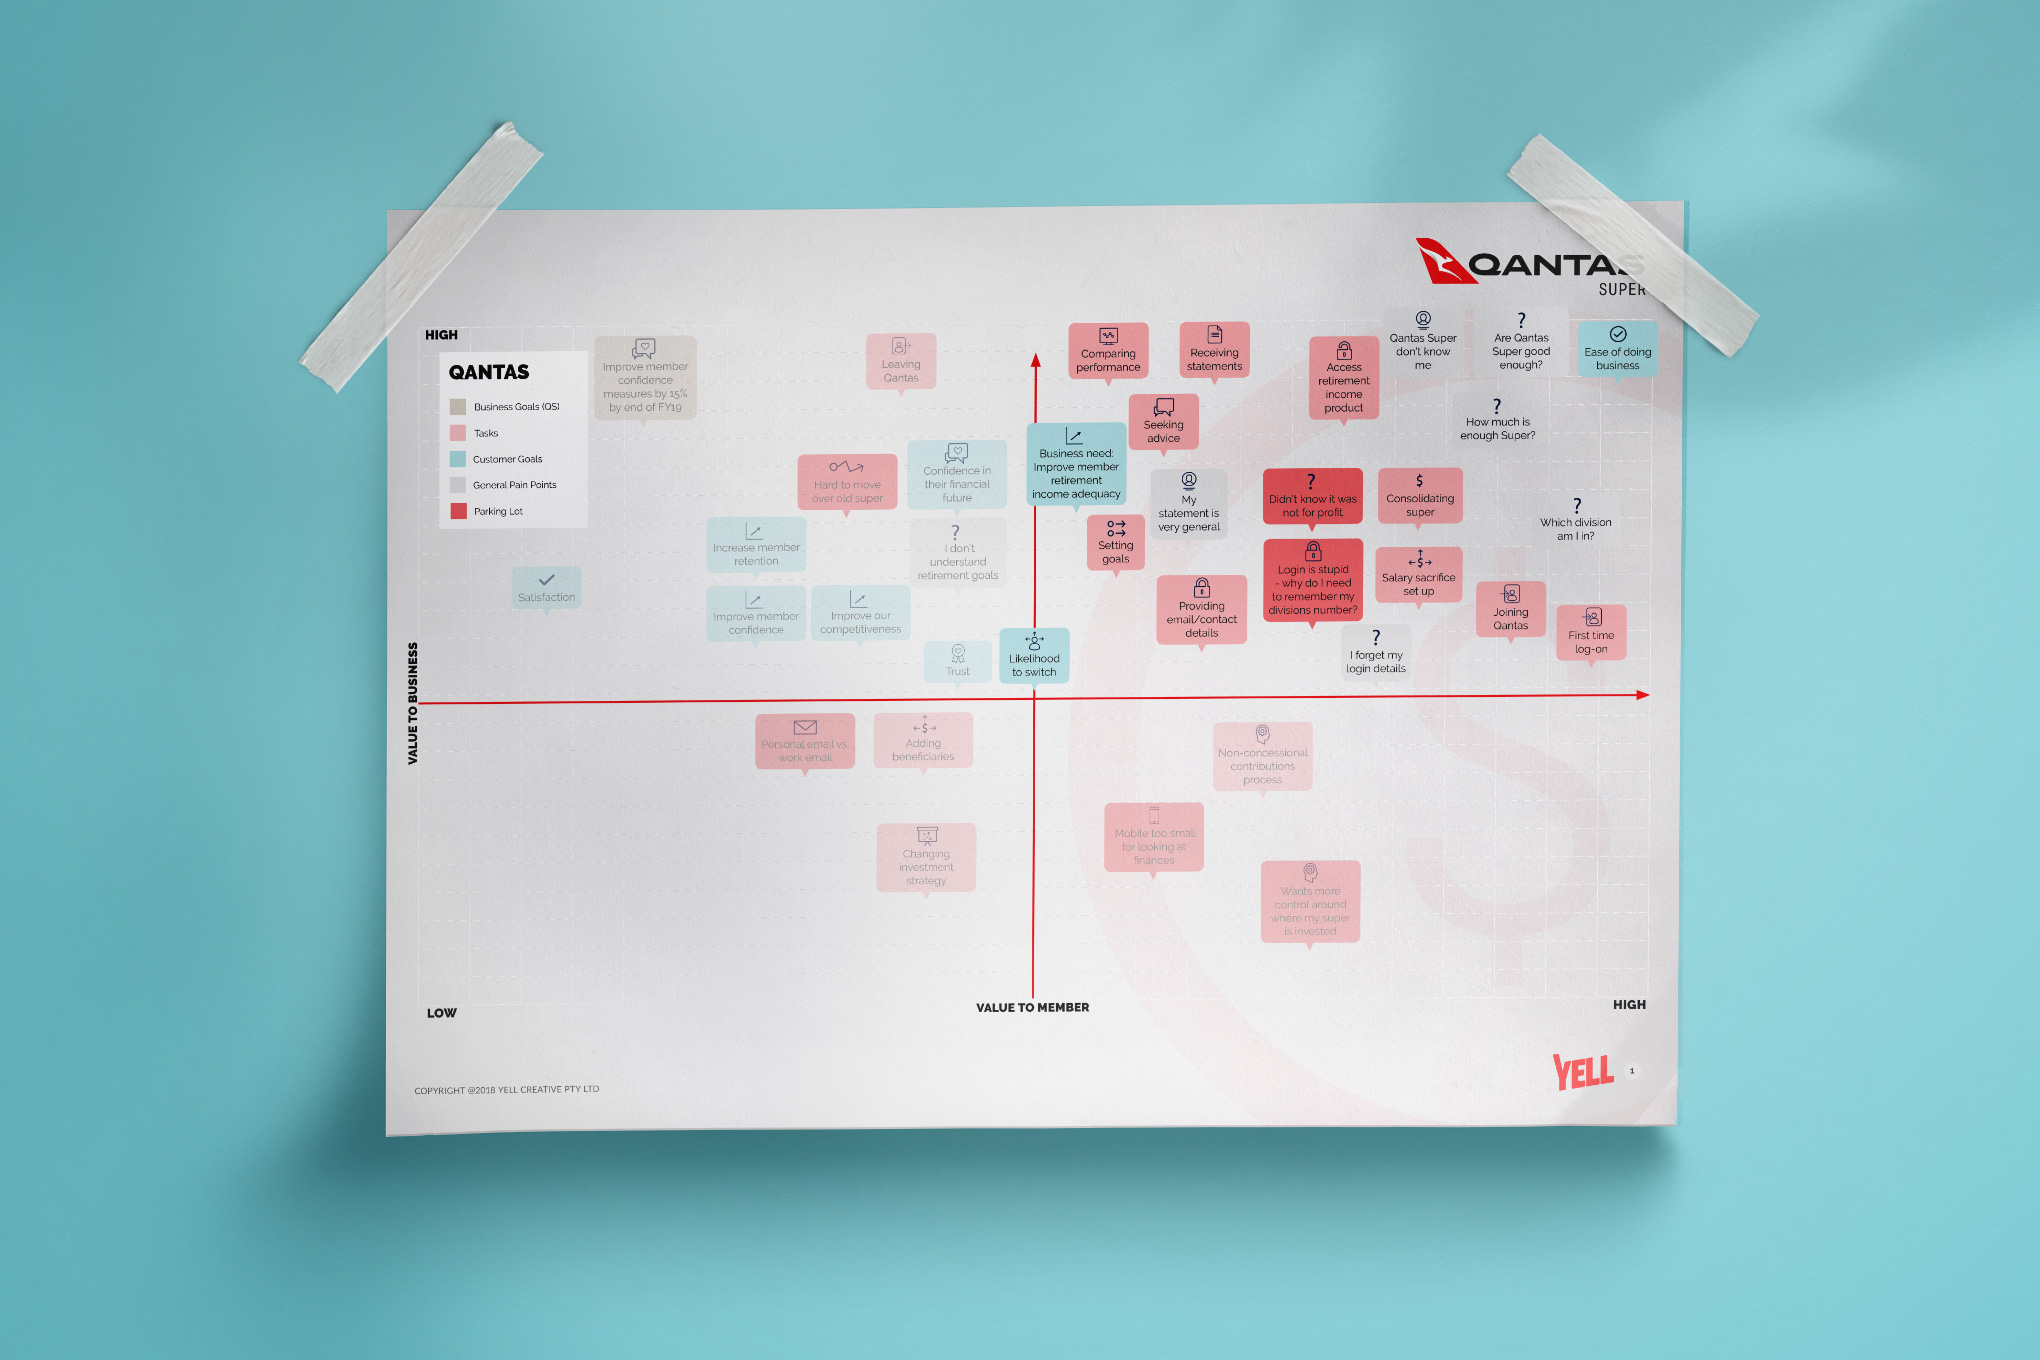 Qantas_CX_matrix_display_2.jpg